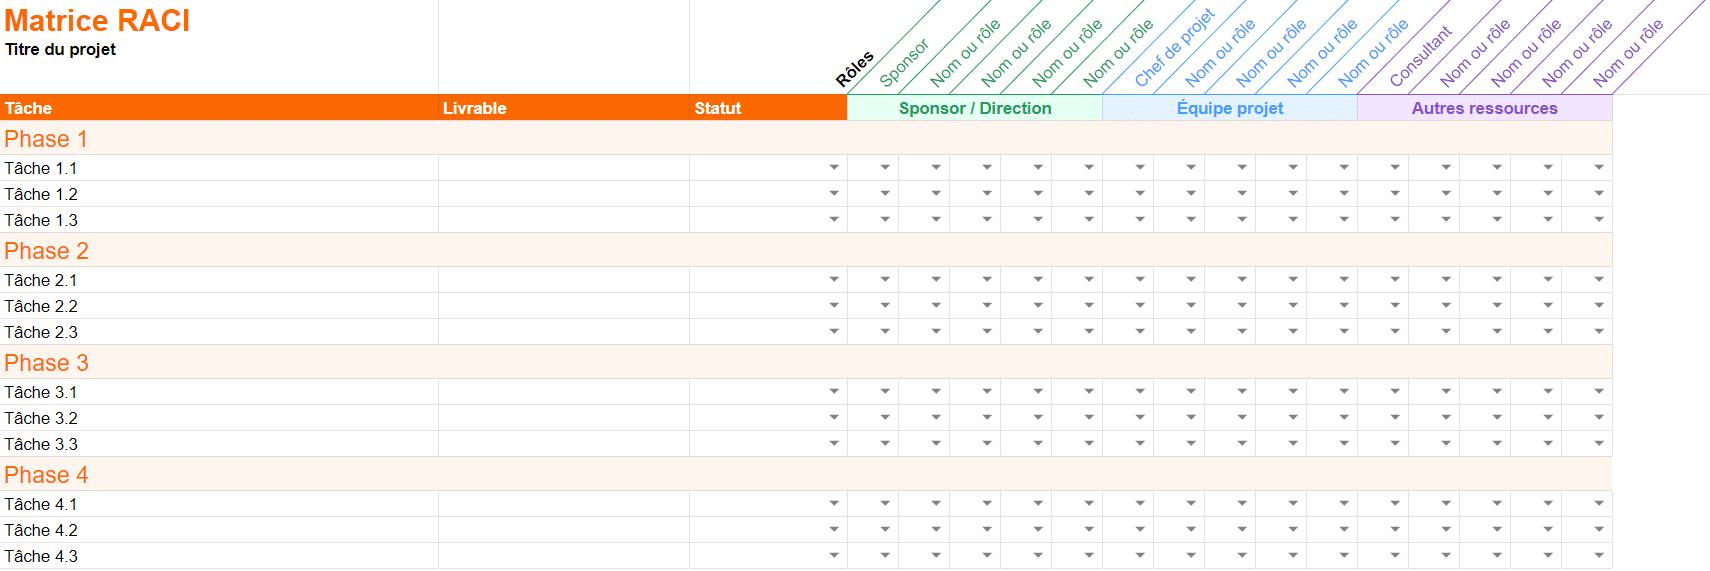 matrice raci vierge excel pdf template francais